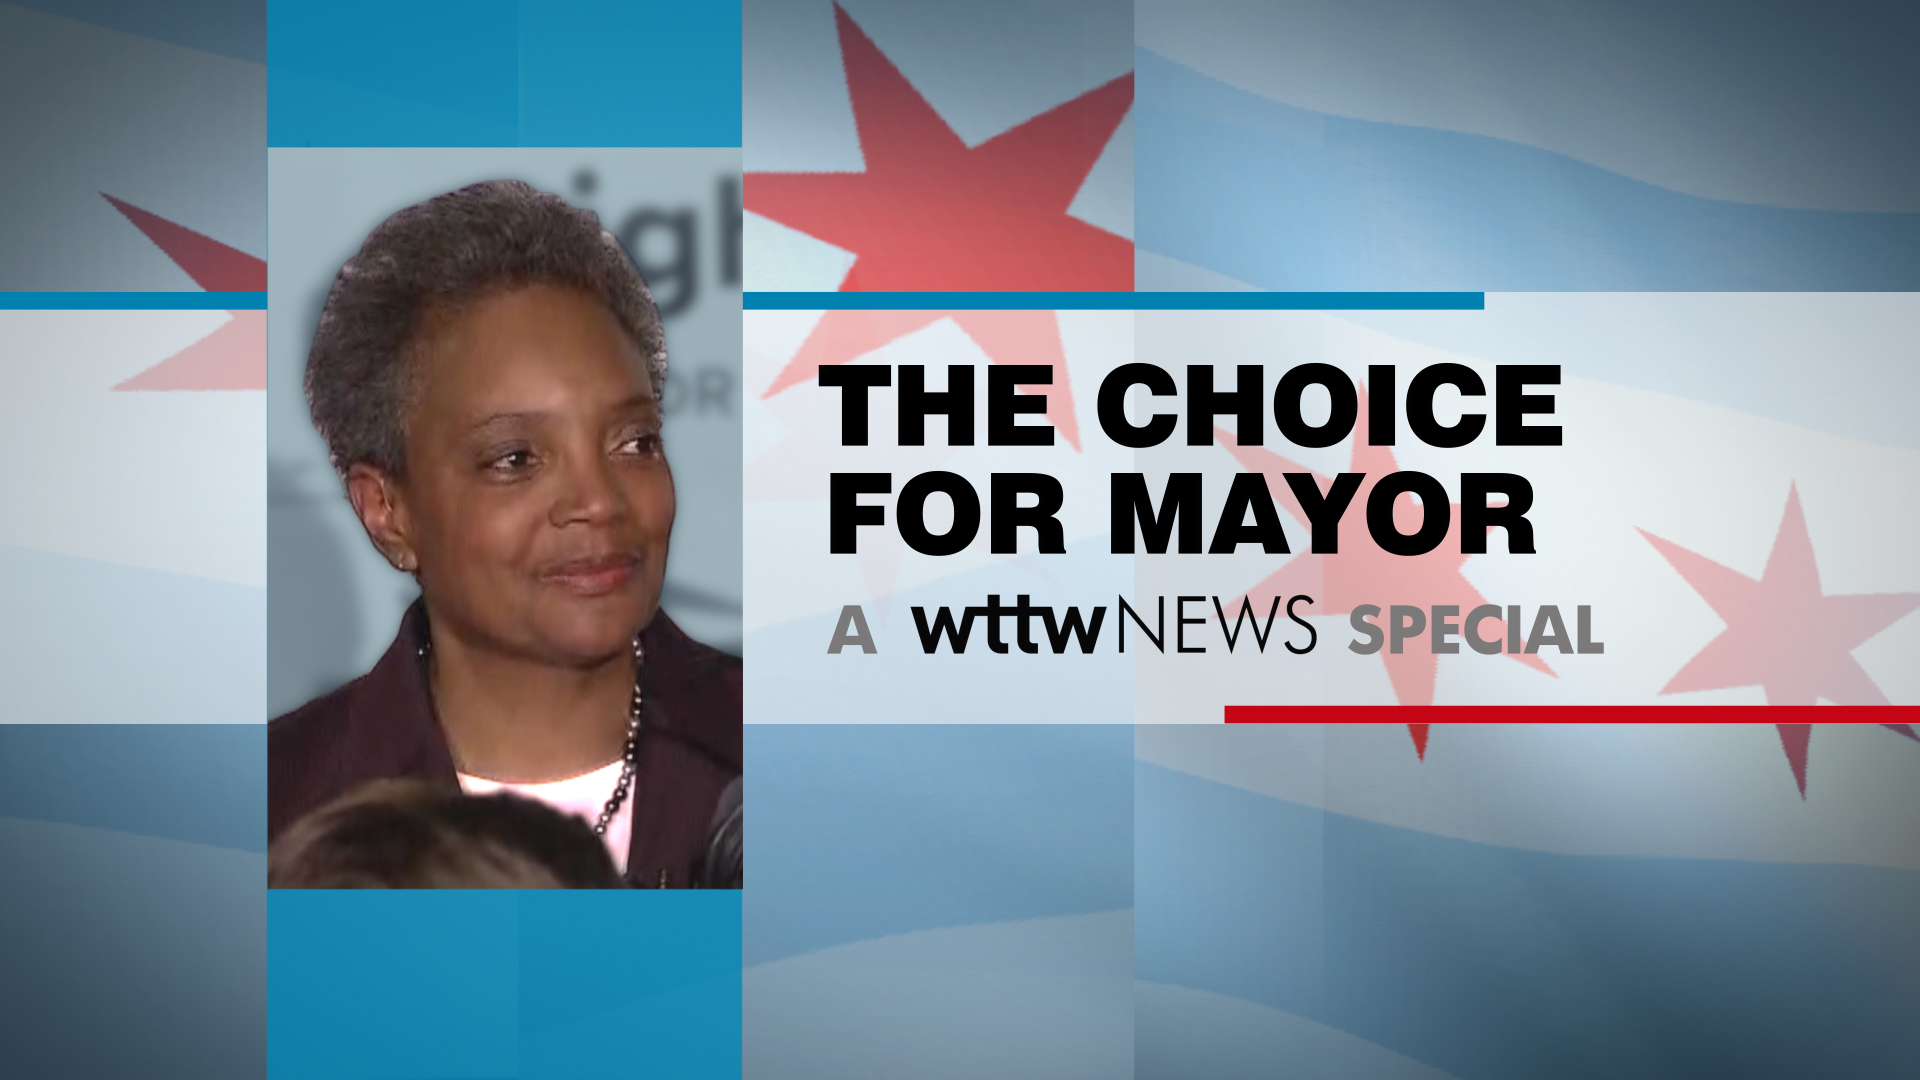 The Choice for Mayor 2019: Lori Lightfoot